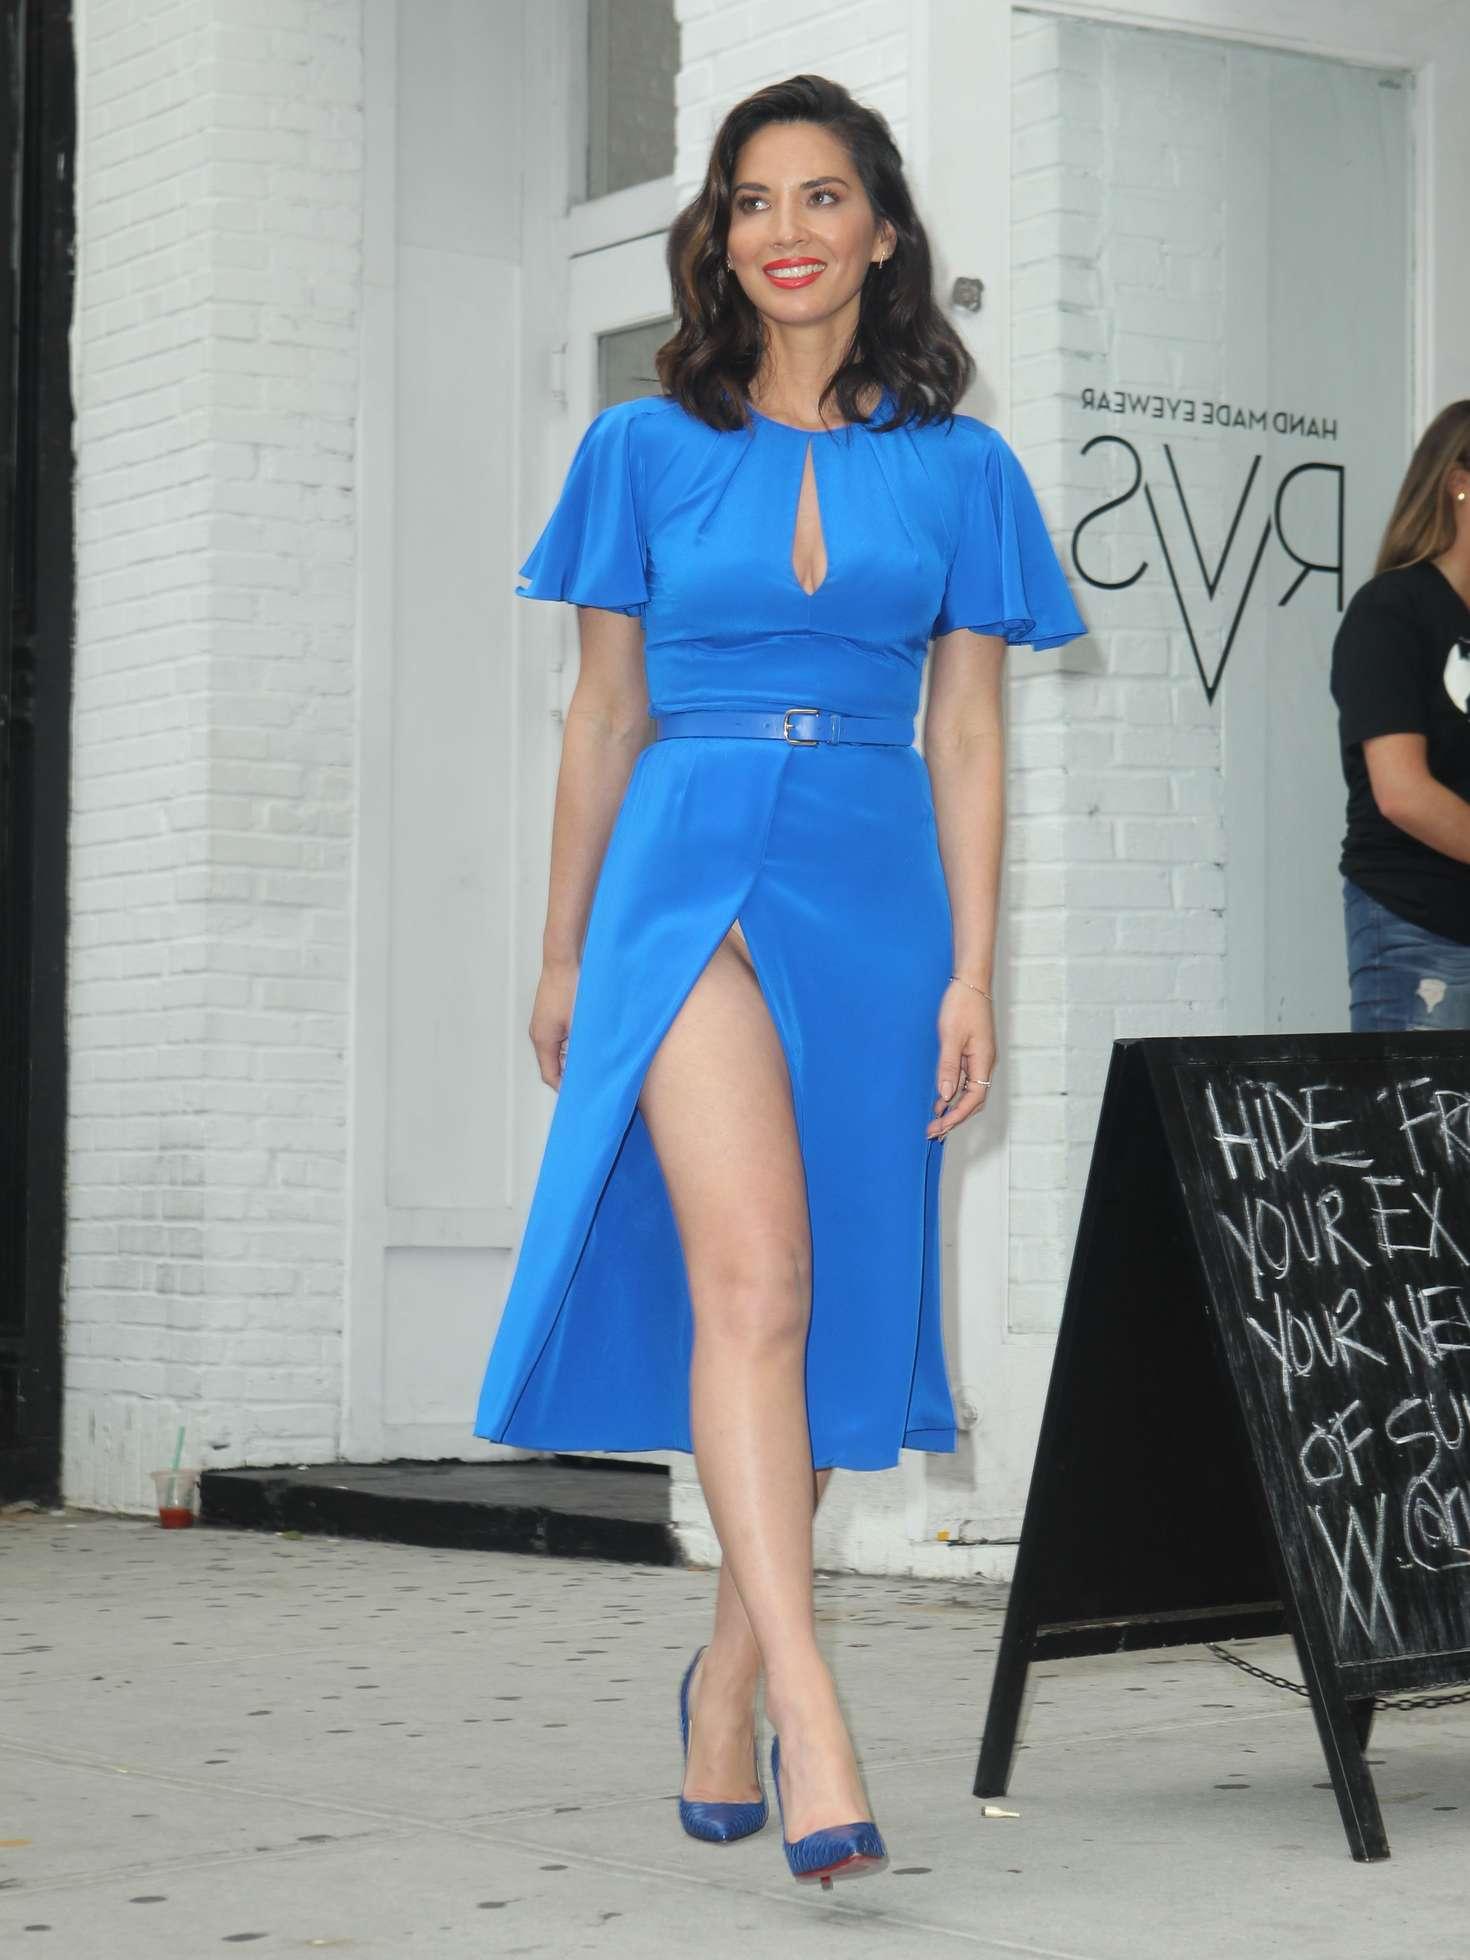 Olivia Munn - Proactiv Pop-Up Experience in New York